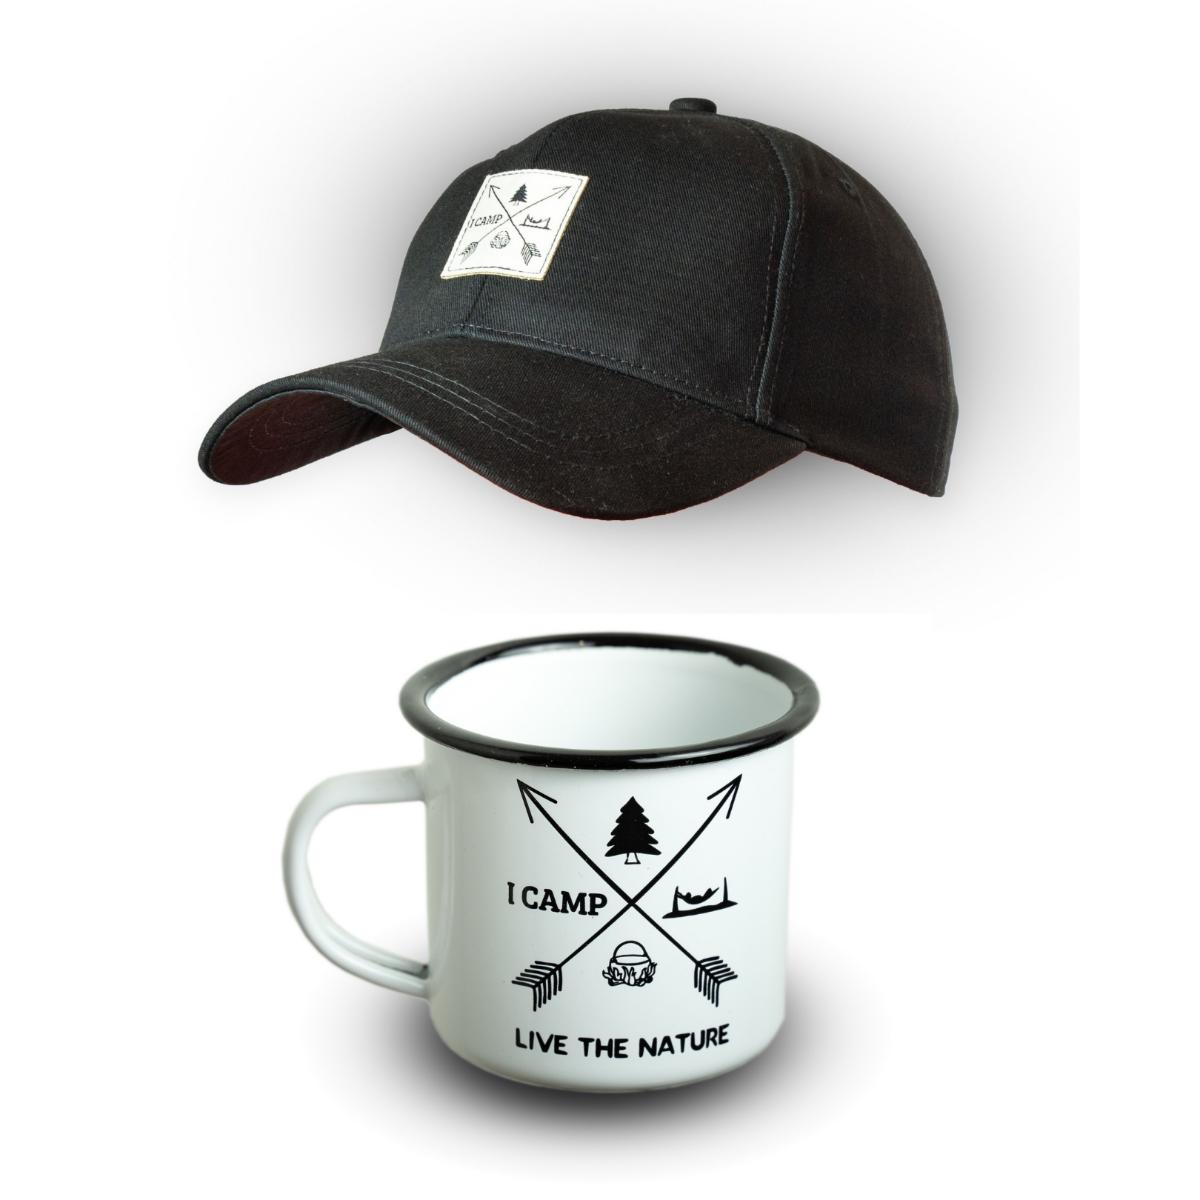 GIFT PACK 1 - כובע + ספל מאג